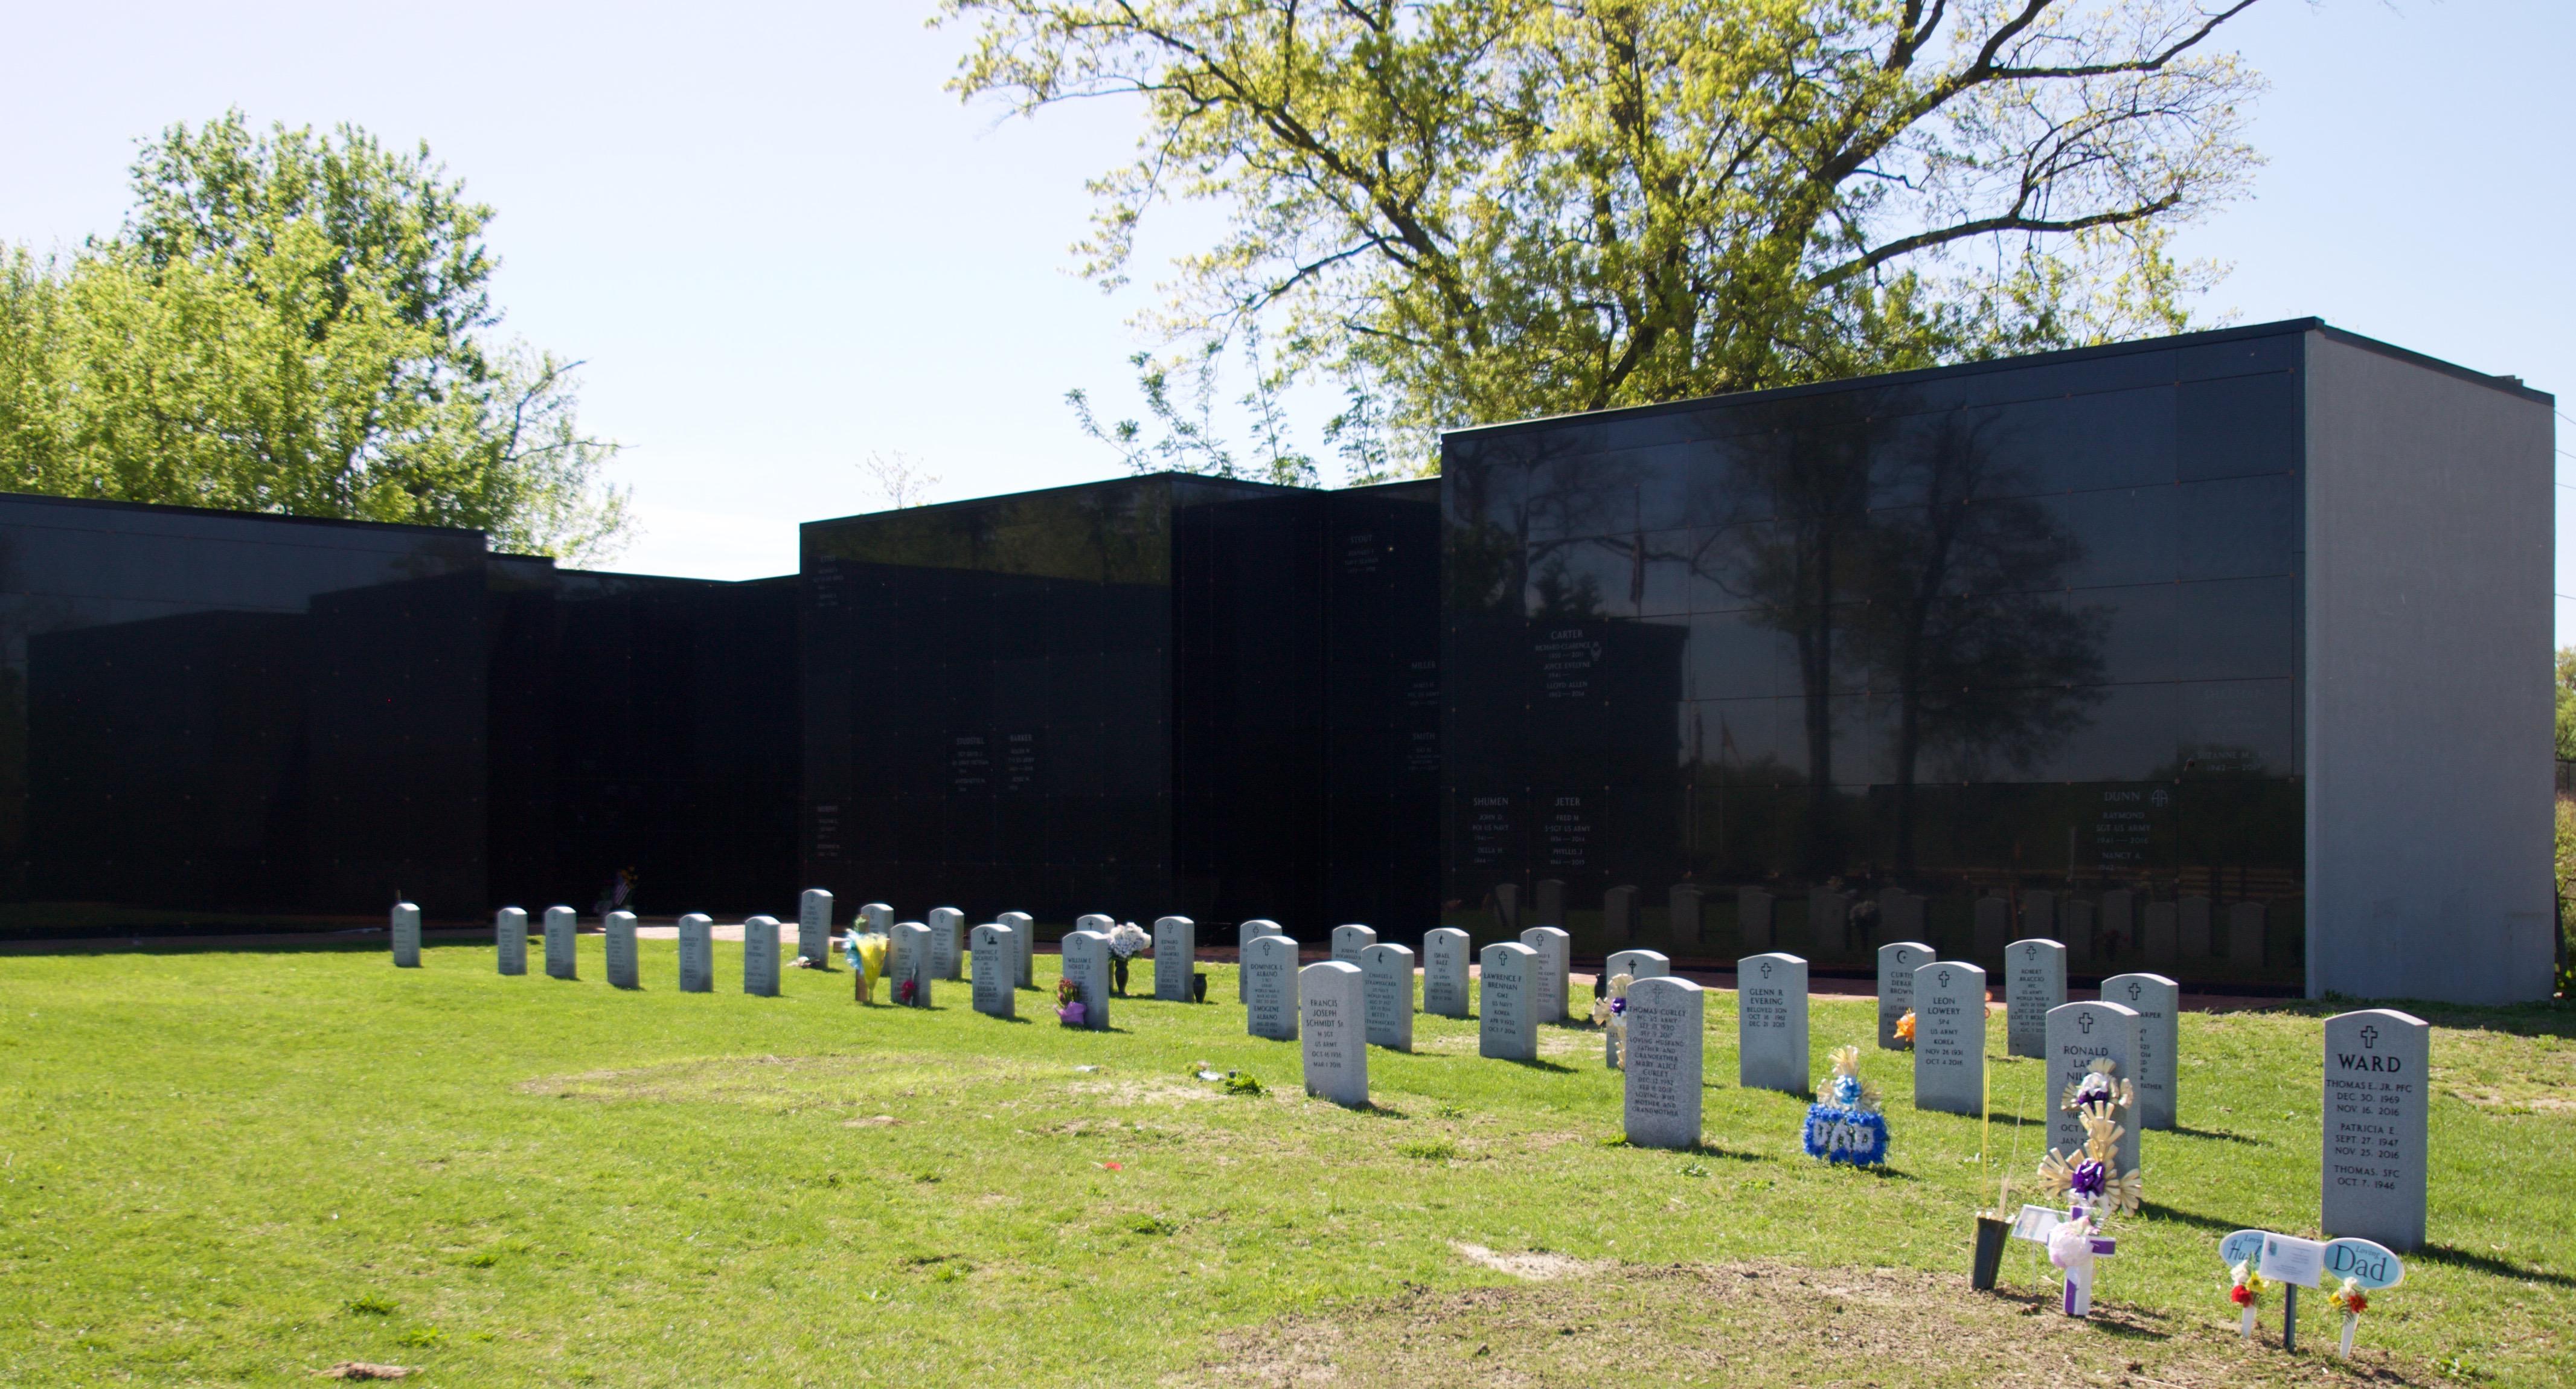 Camden County Veterans Cemetery image 5